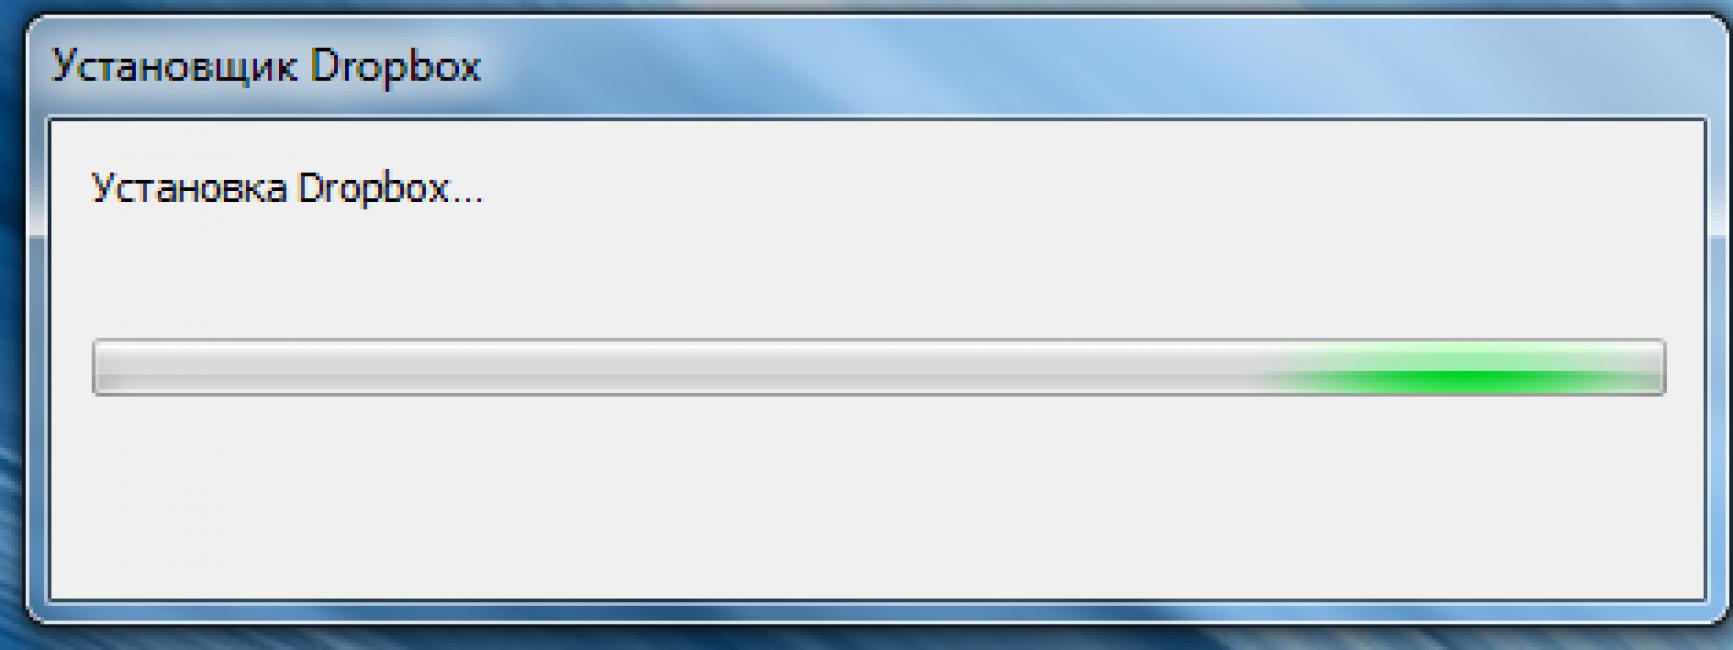 Окно установки DropBox на компьютер